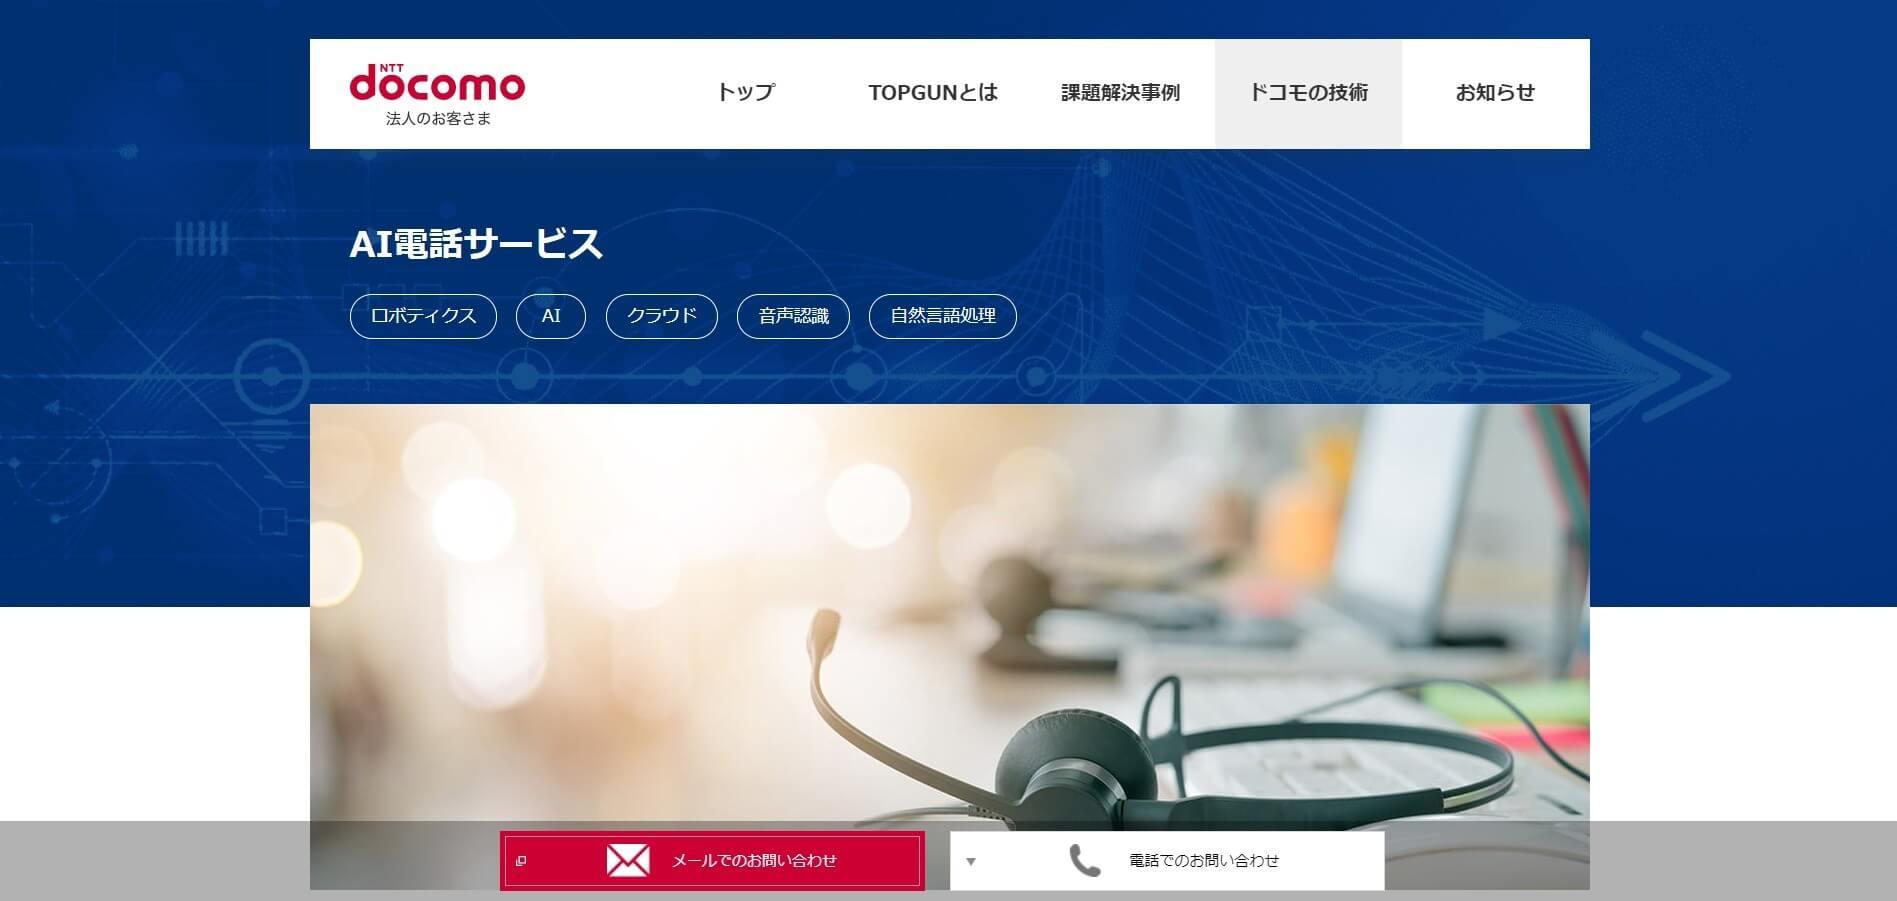 AI 電話サービス(株式会社NTTドコモ)